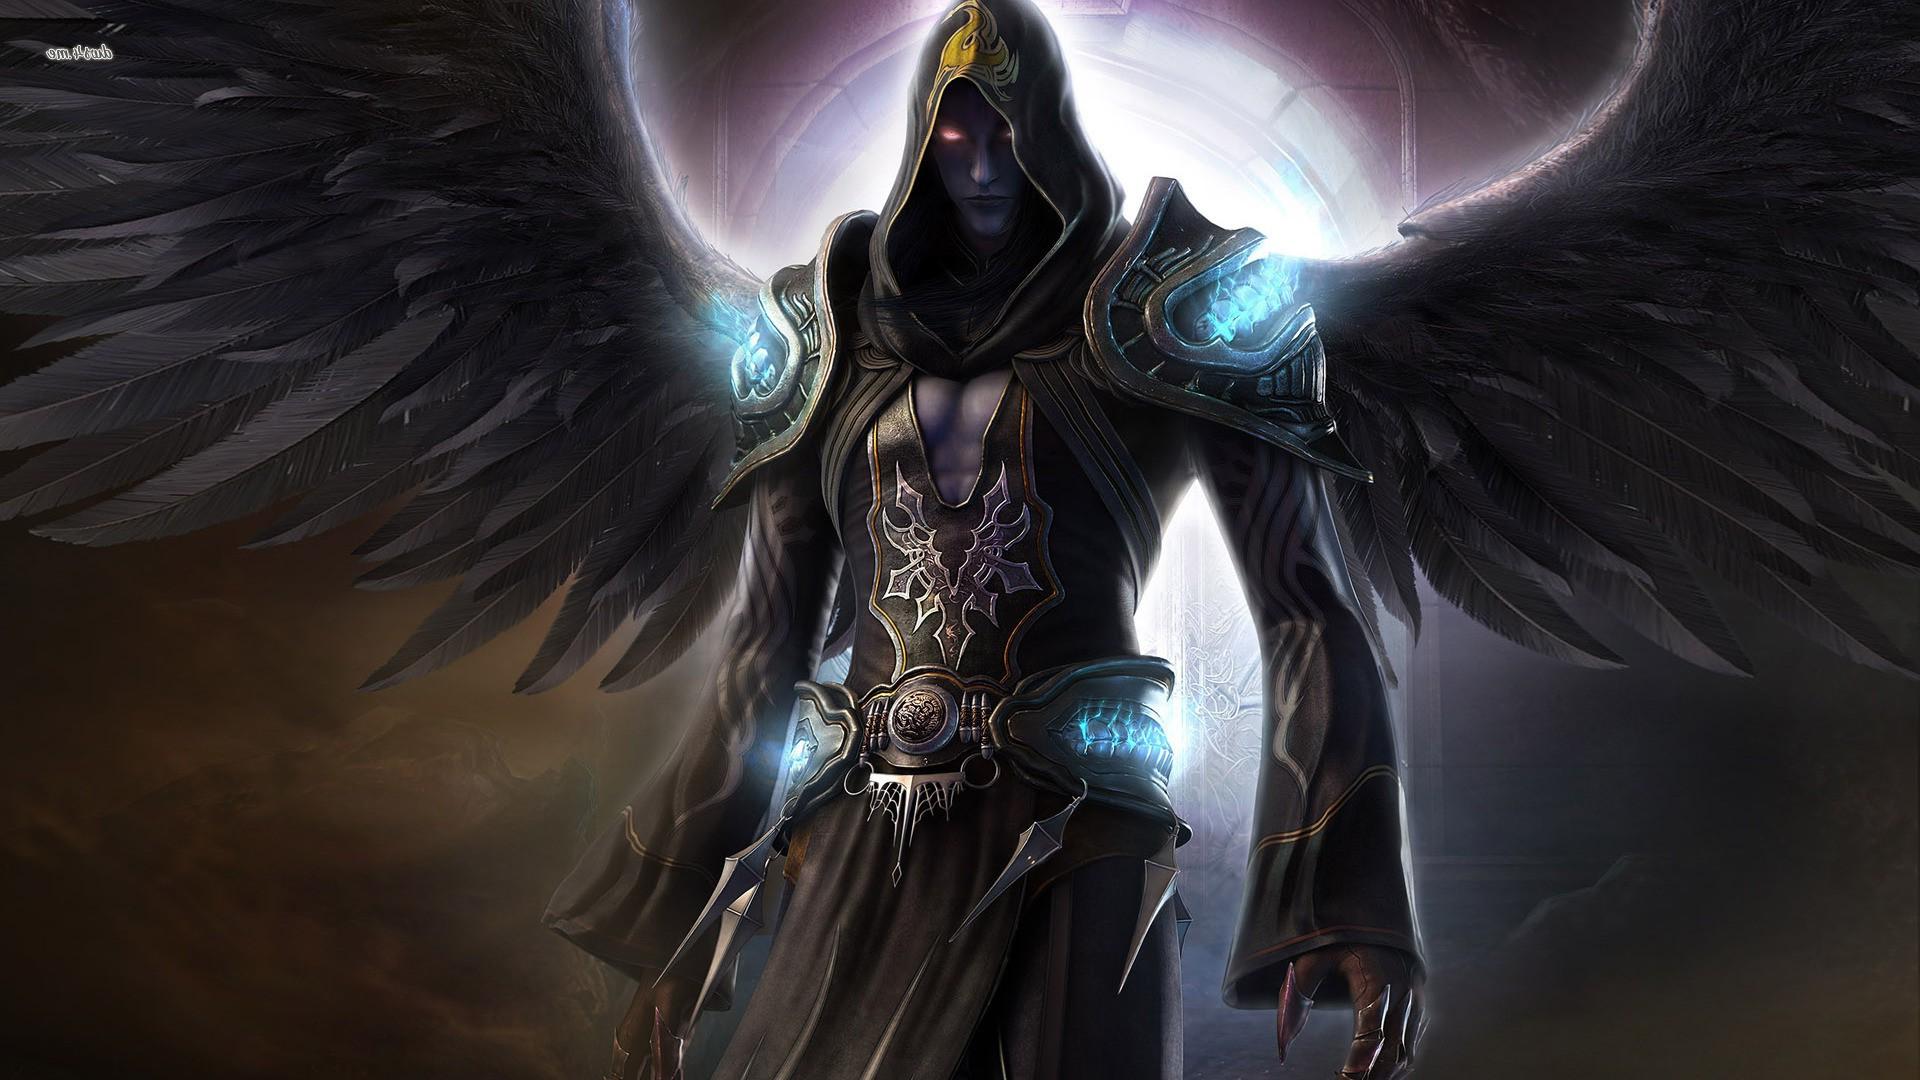 Wallpaper 1920x1080 Px Angel Dark Angel Dark Fantasy